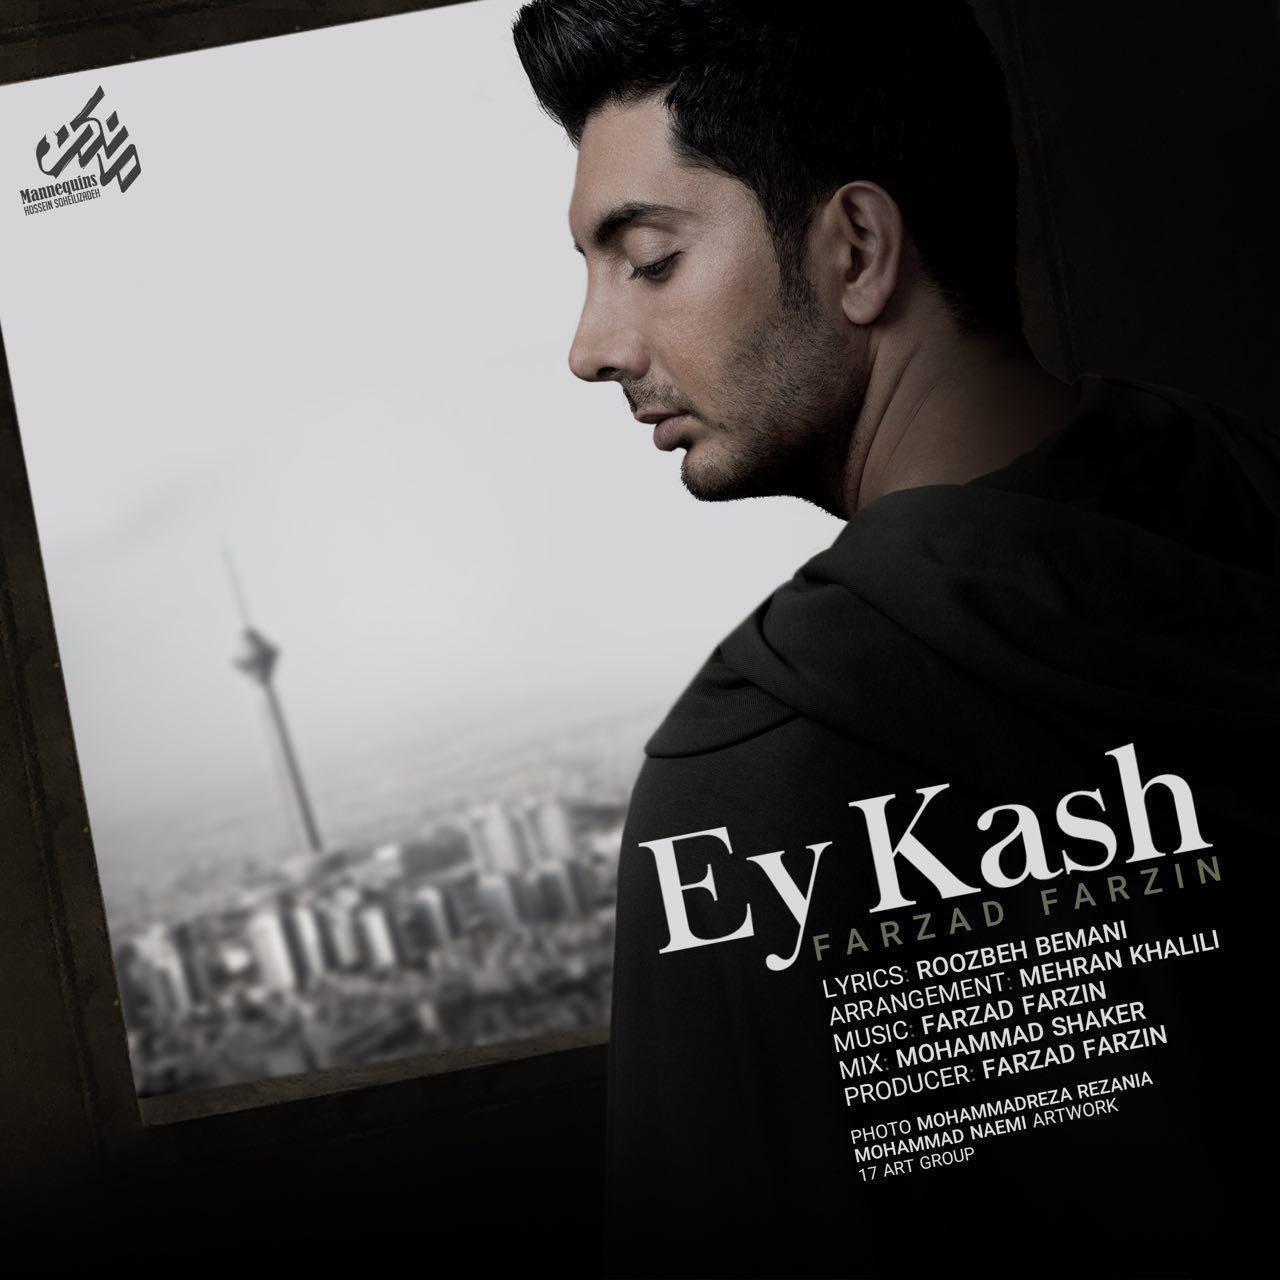 Farzad Farzin - Ey Kash